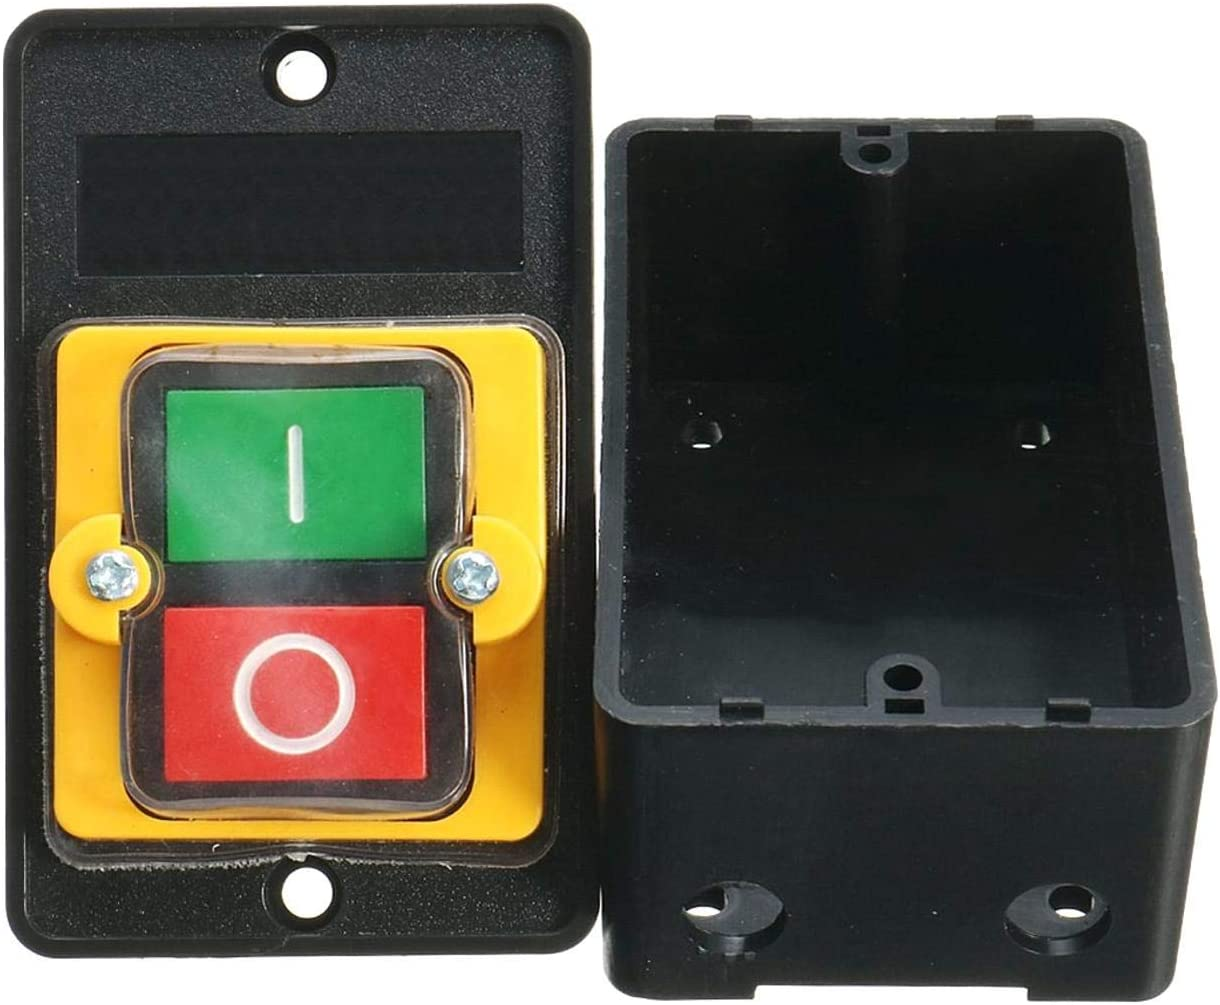 380V Bot/ón de Encendido//Apagado a Prueba de Agua Bot/ón de Interruptor KAO-5 Negro Taladro Motor M/áquina Uso Impermeable Push AC 220